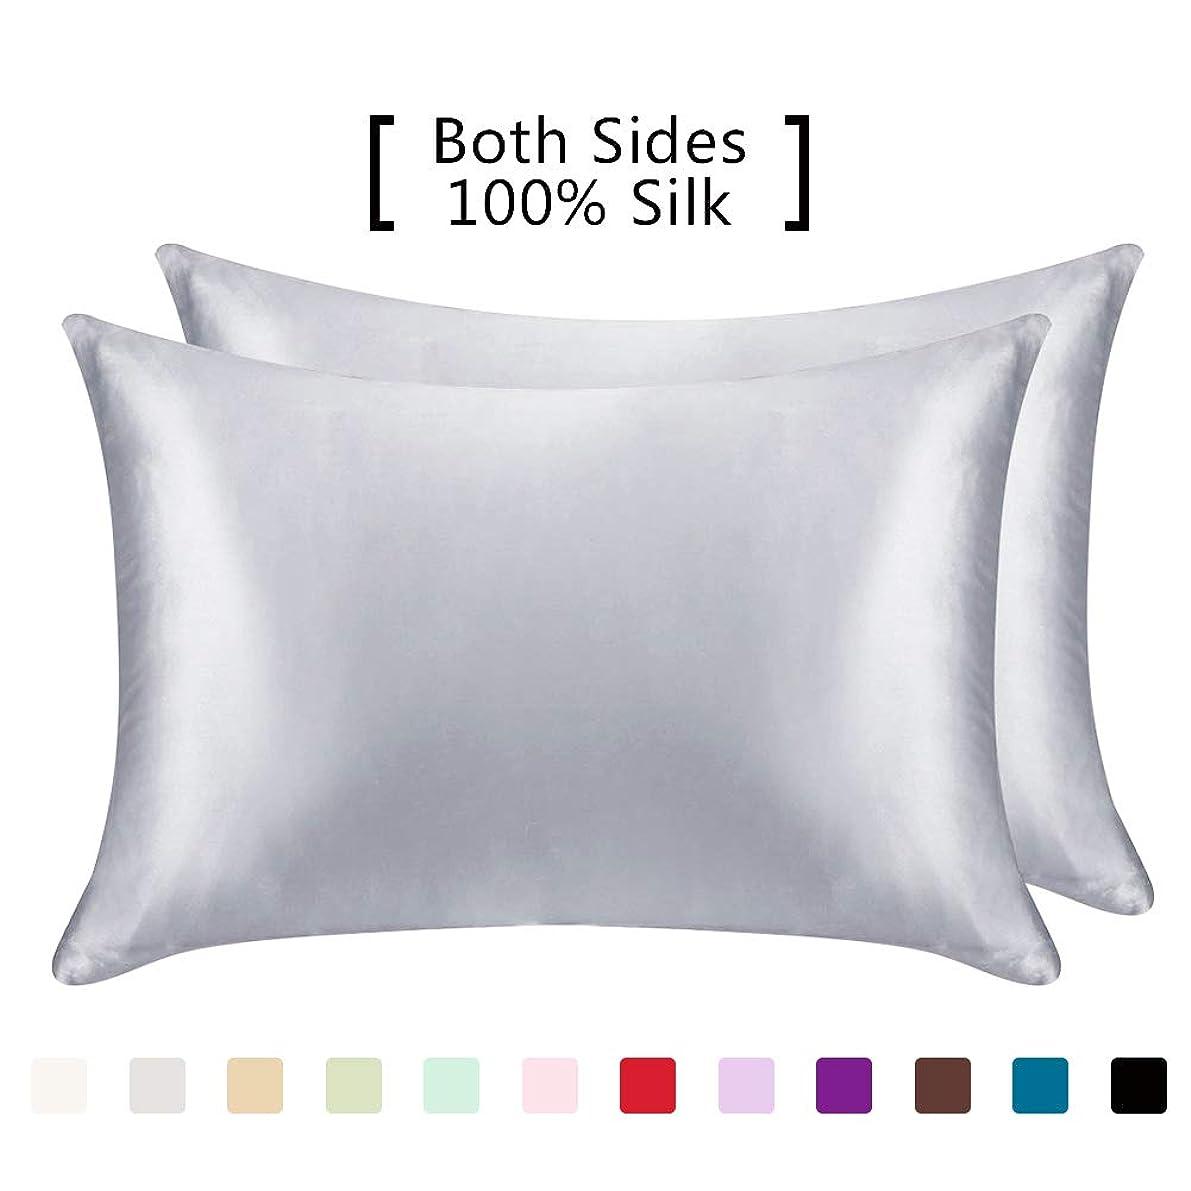 YANIBEST Pillow Cases 2 Pack 100% Mulberry Silk Pillowcase for Hair and Skin with Hidden Zipper (Standard Pillowcase Set of 2, Grey)